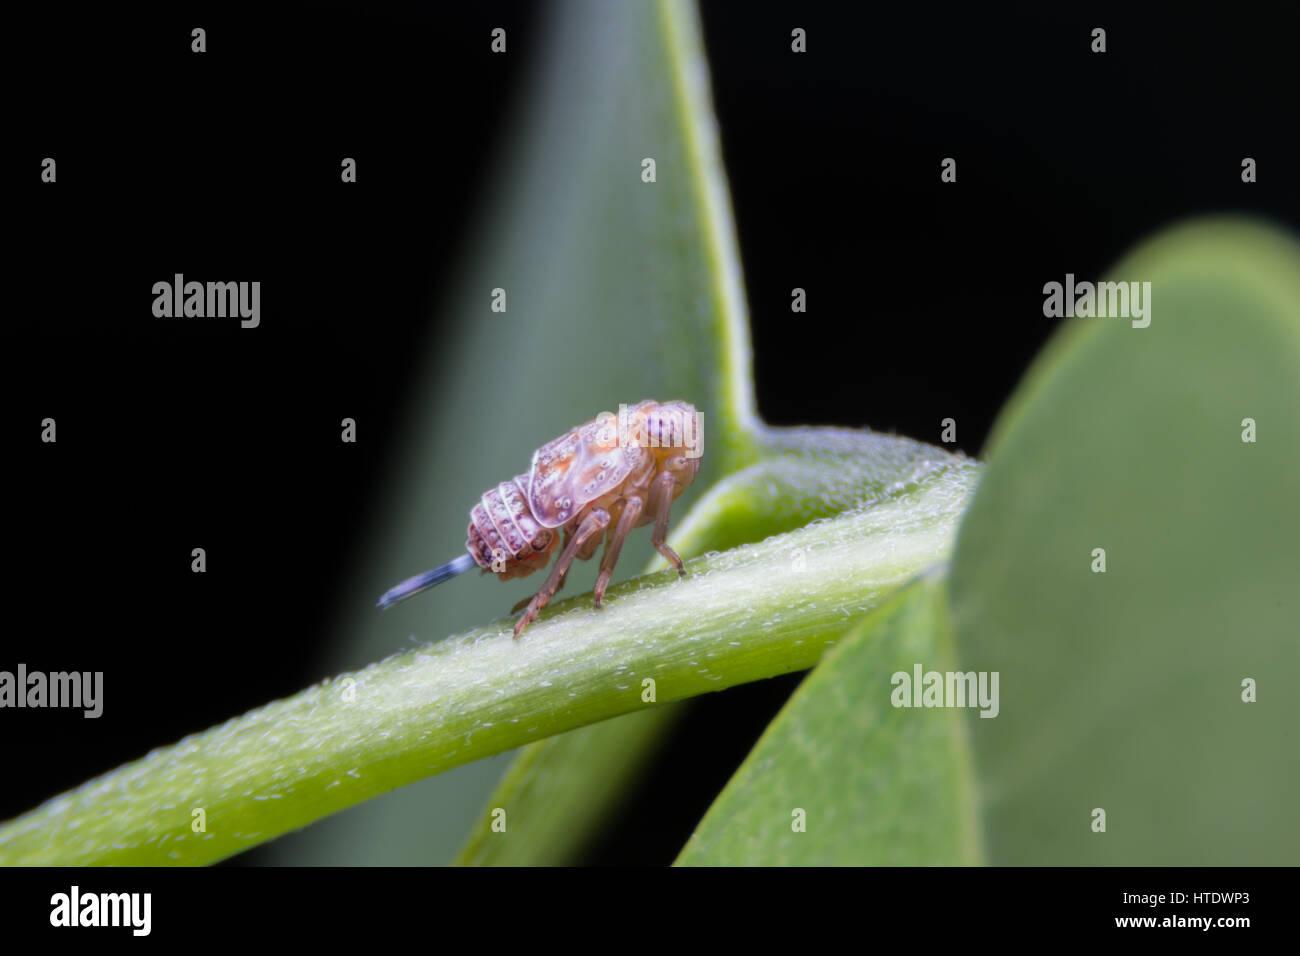 Insect Praying Mantis Walking Stick Green High Resolution Stock